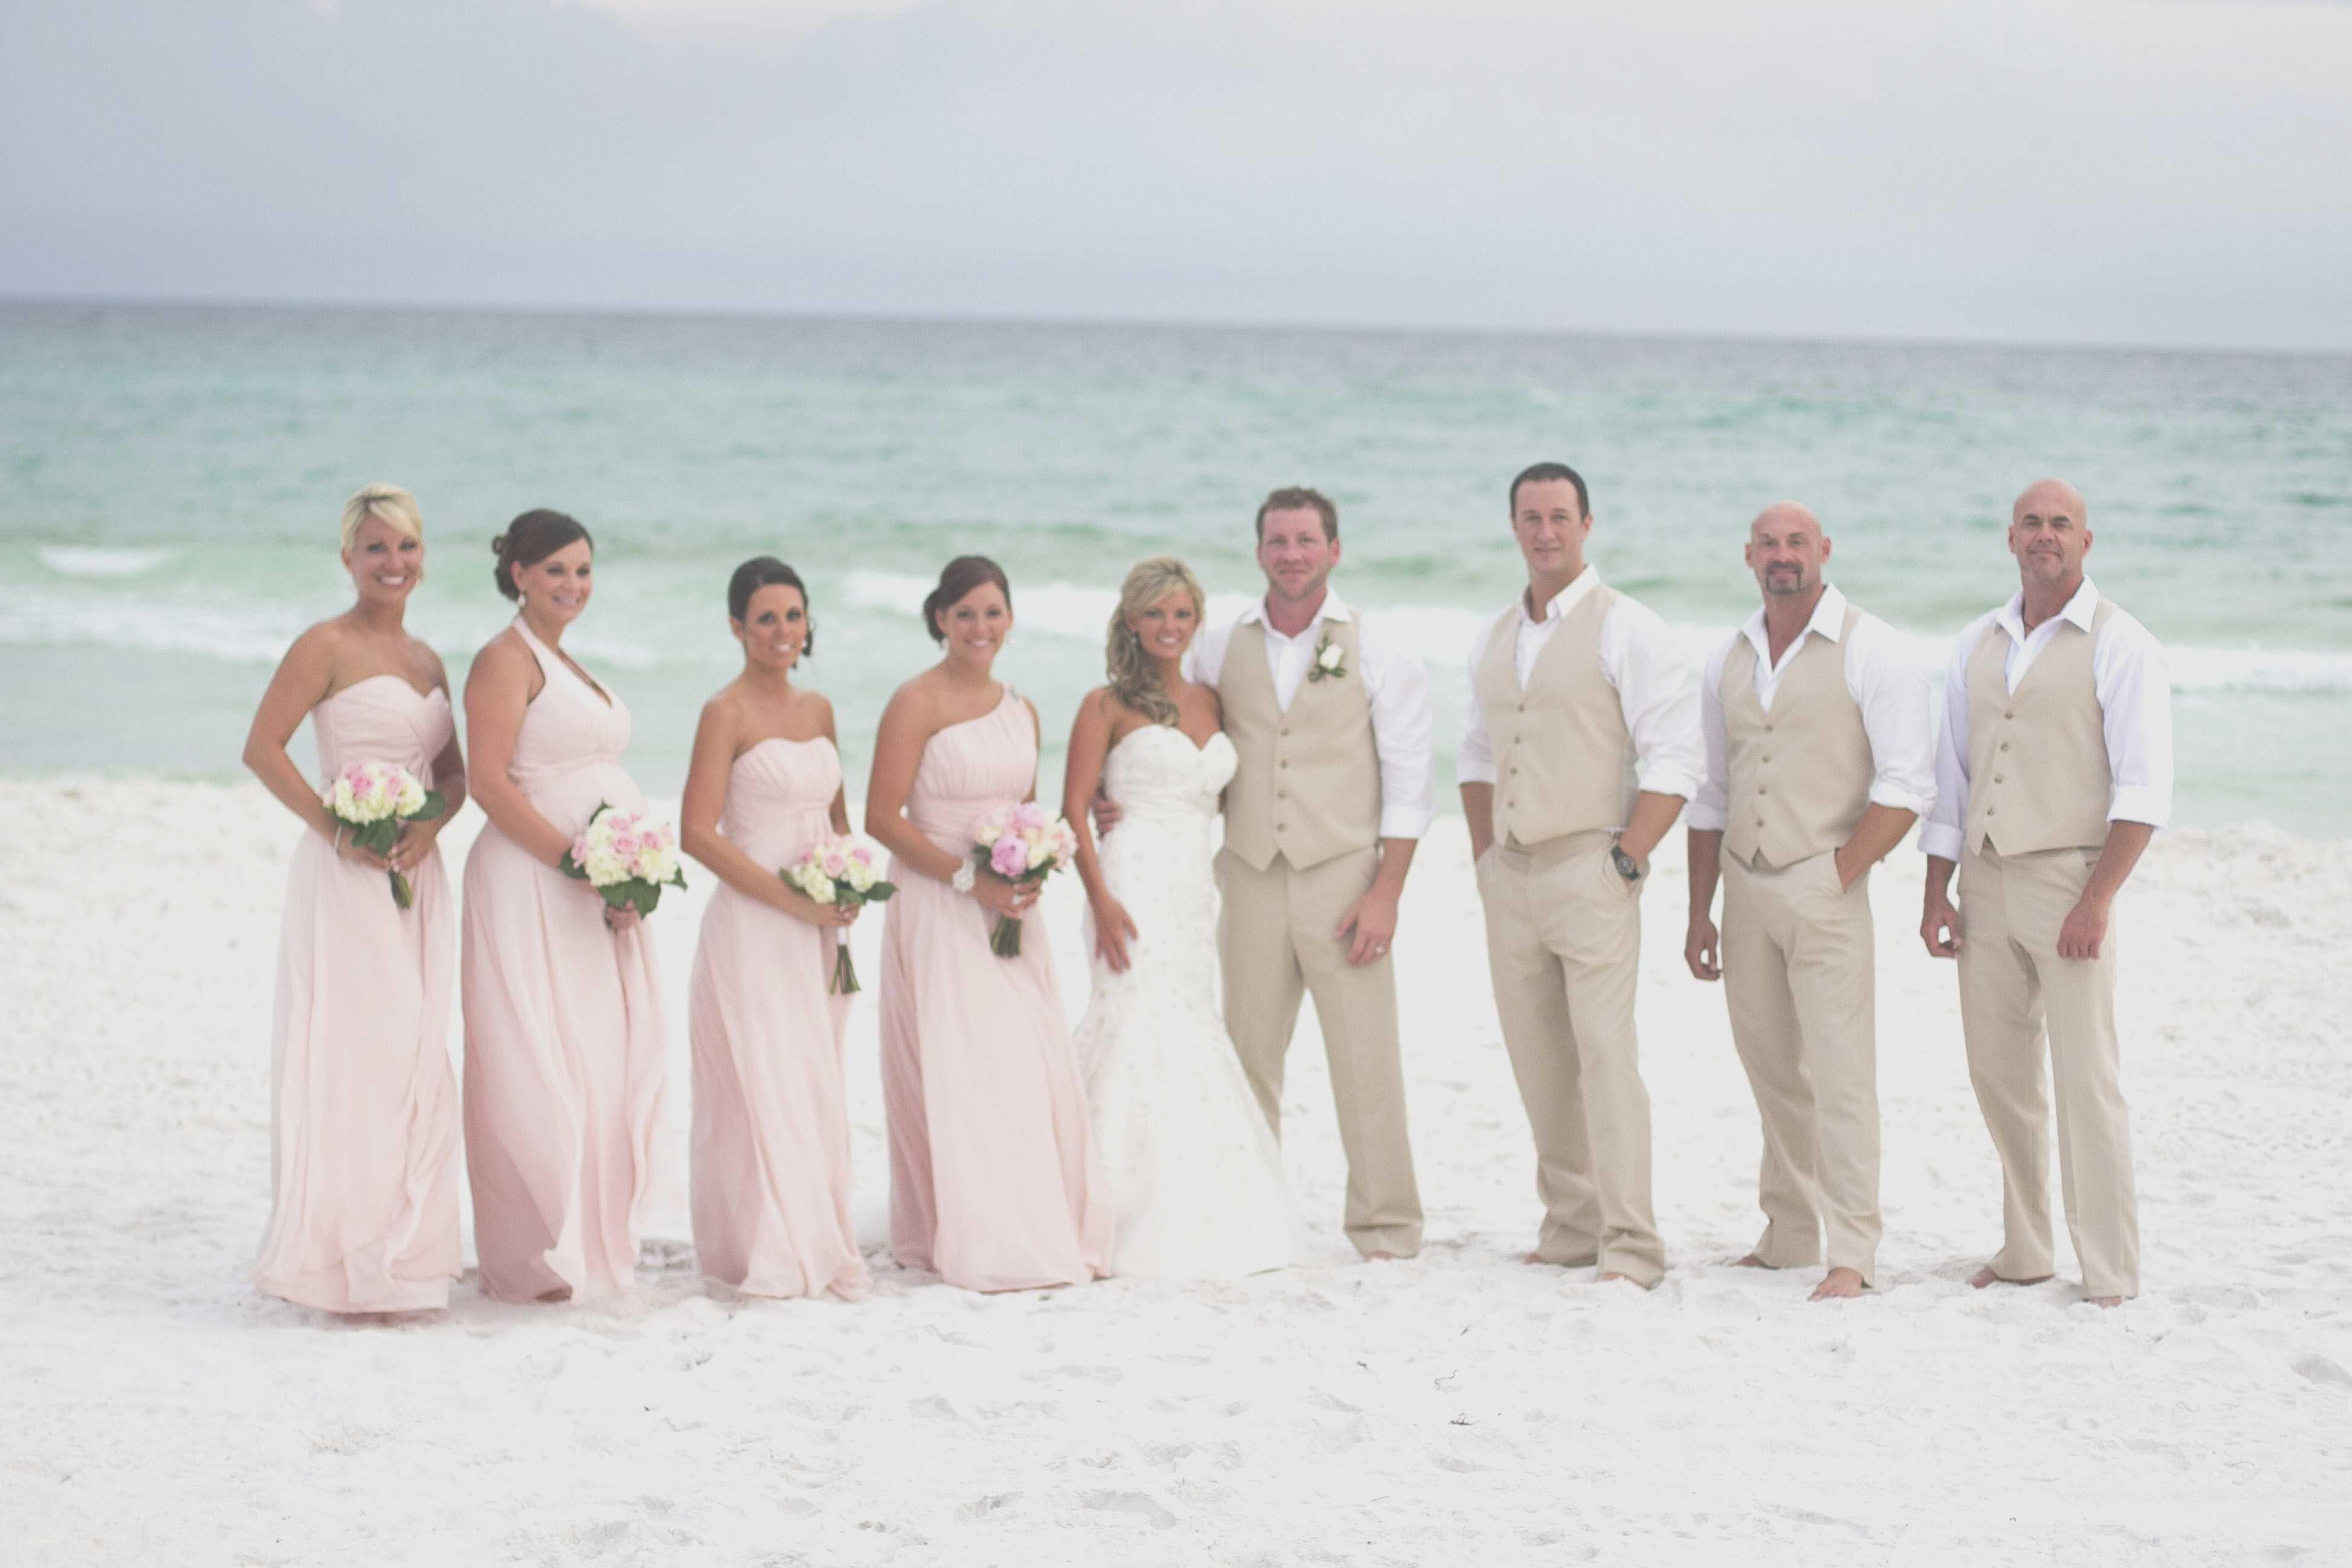 Elegant Groomsmen Attire Tan Champagne Bridesmaid Dresses Beach